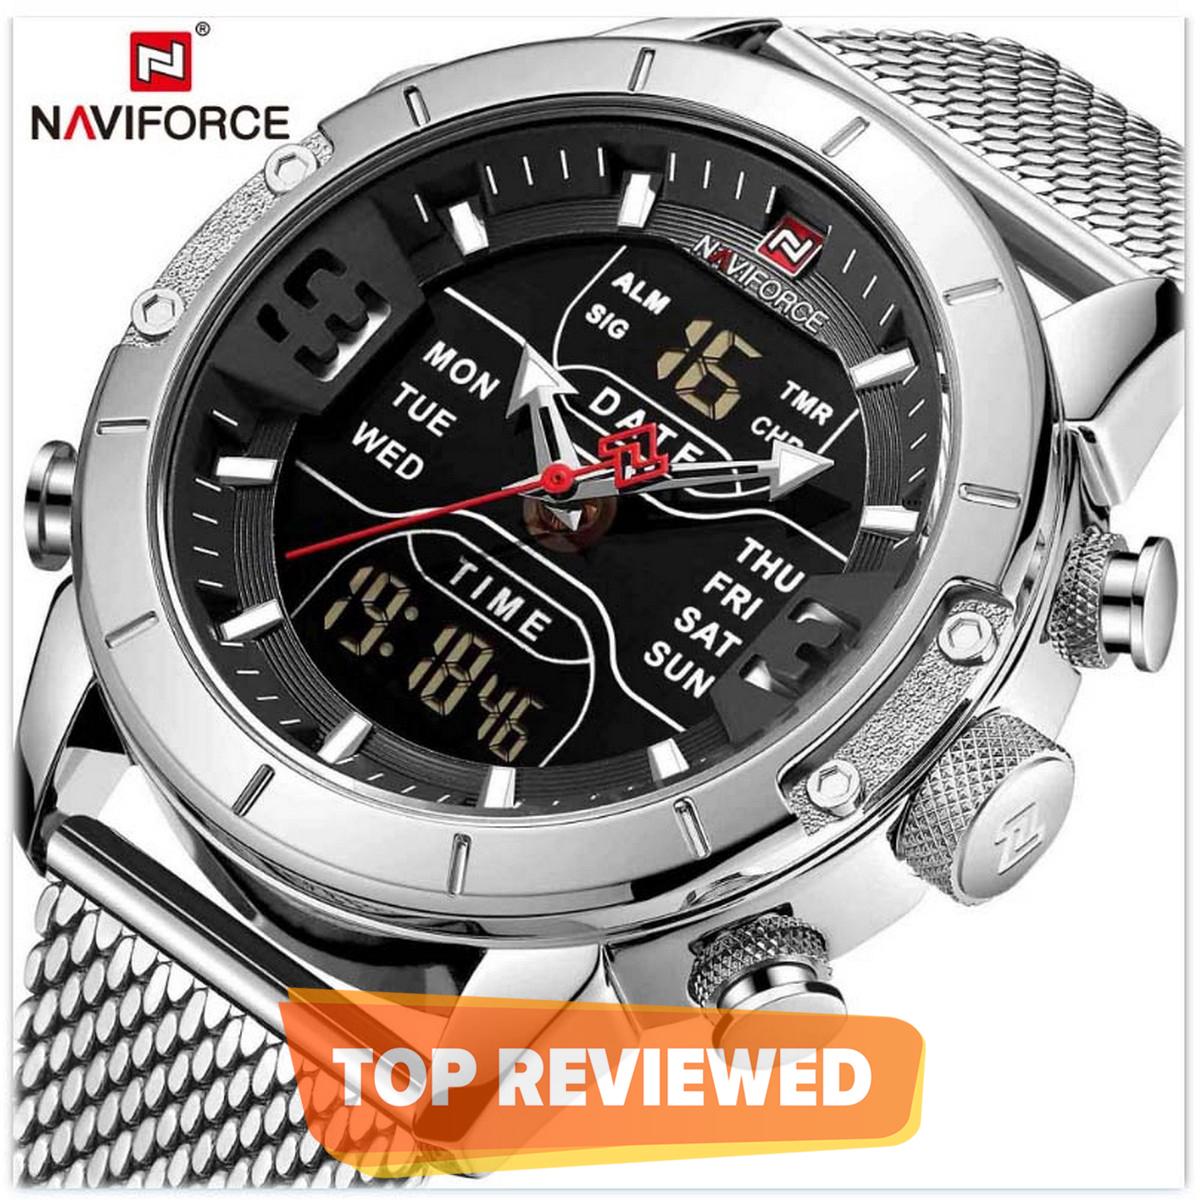 NAVIFORCE 9153 Japan Movement Dual Display Stainless Steel Quartz Waterproof Men's Watch With Brand Box